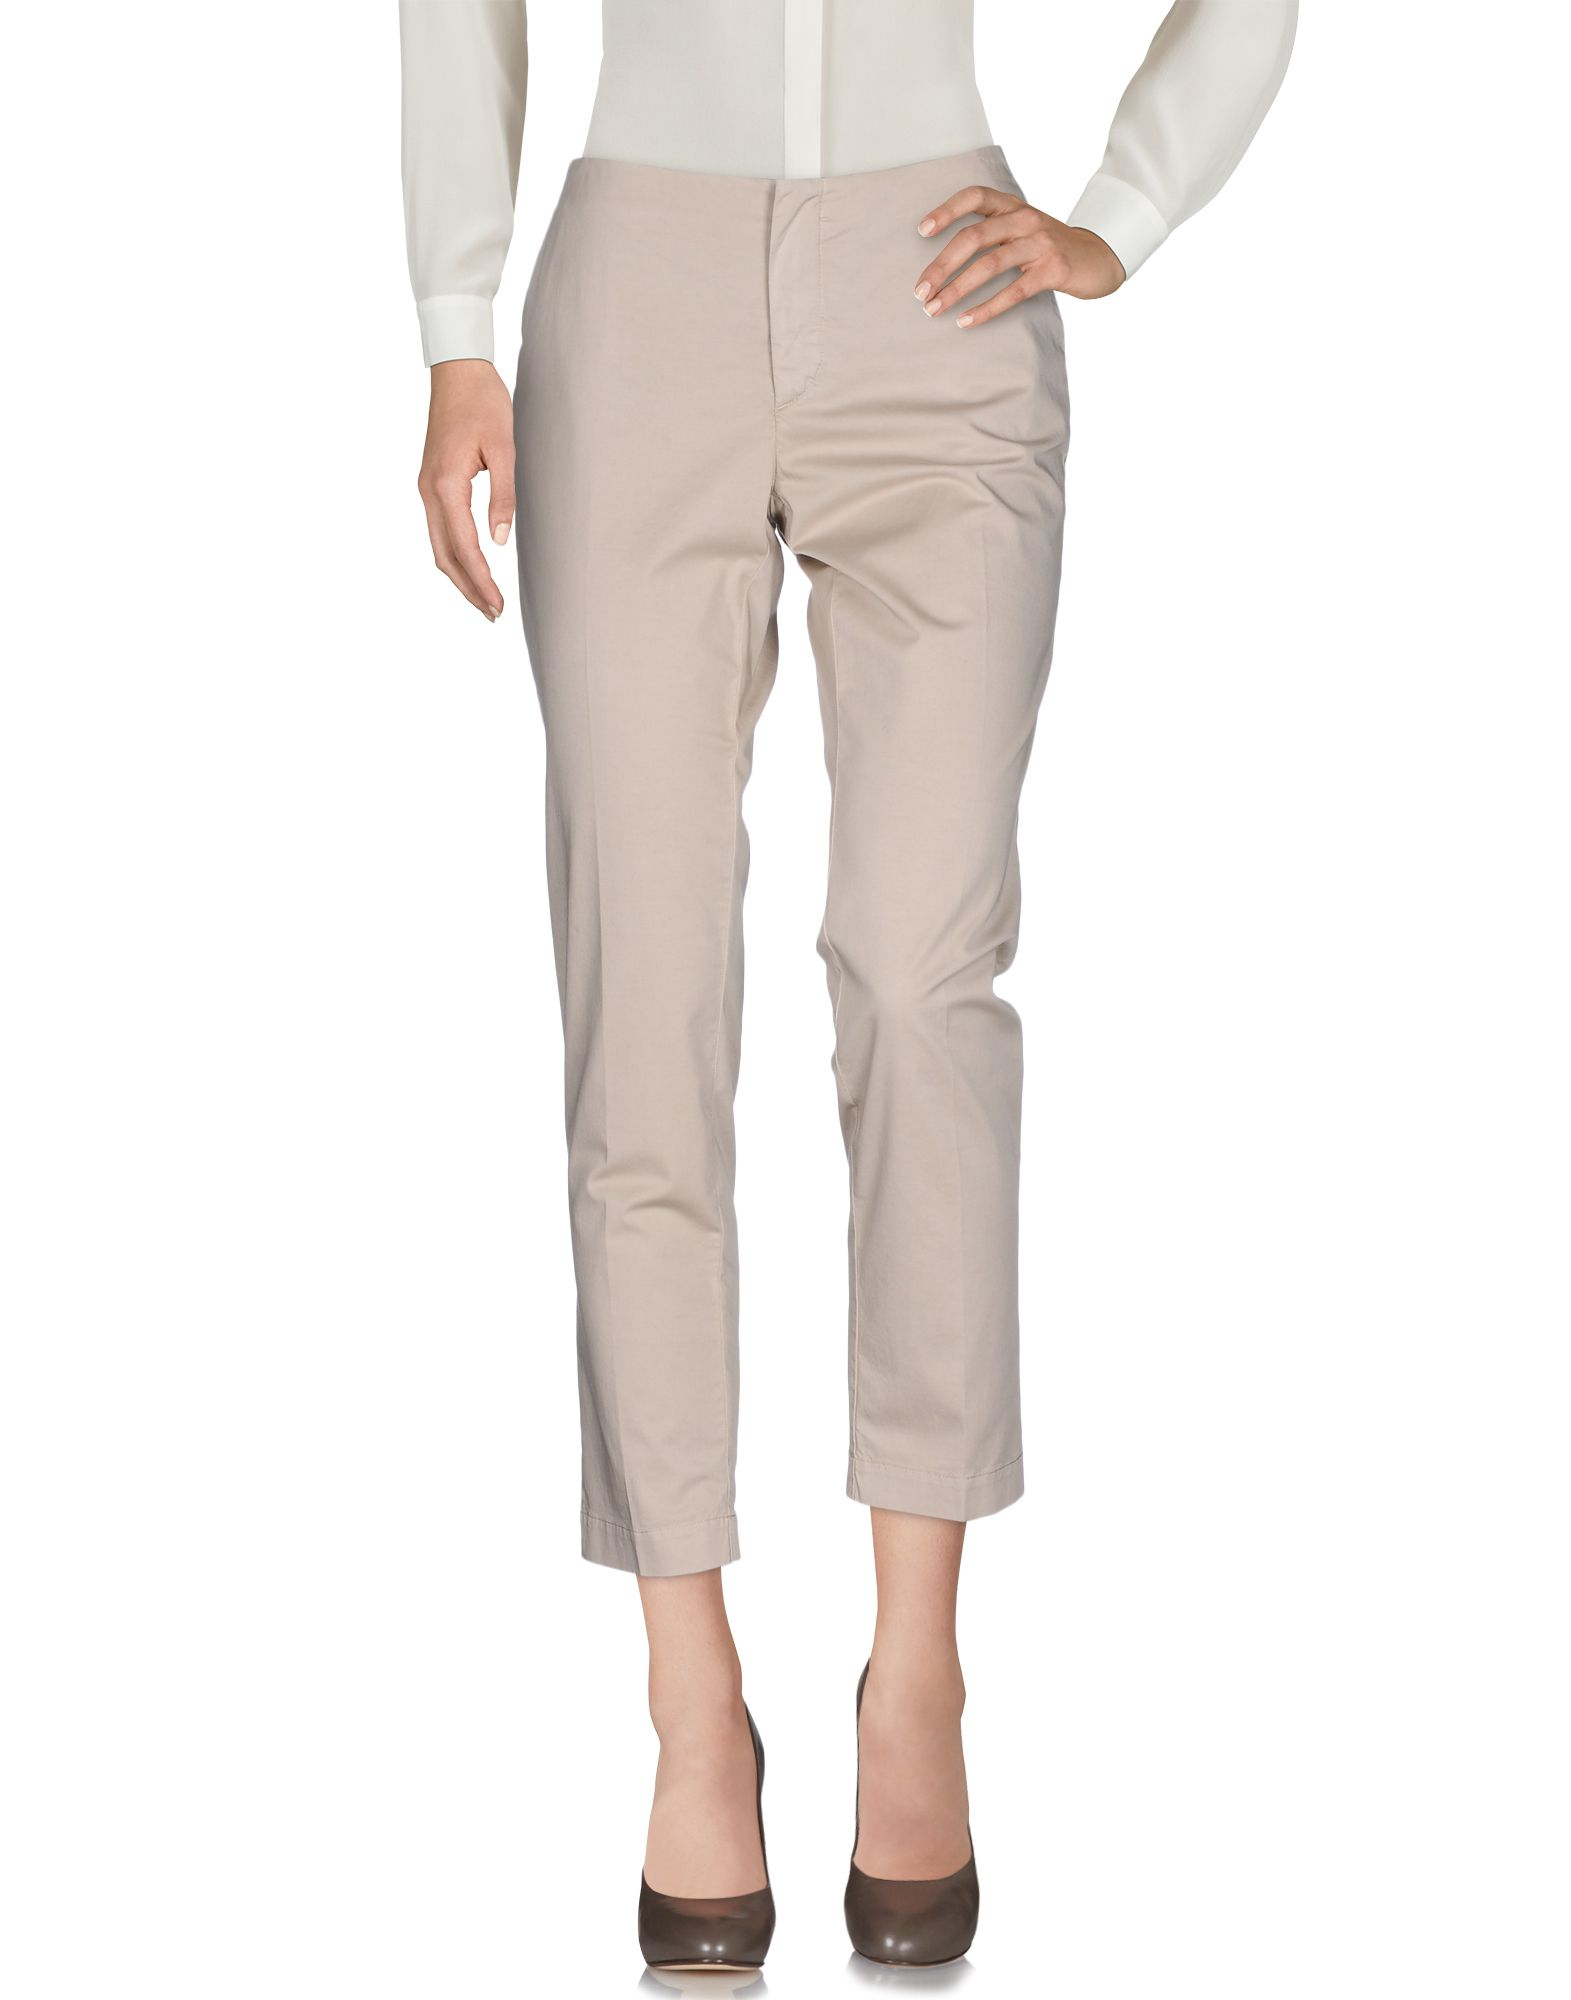 TERESA DAINELLI Casual Pants in Beige